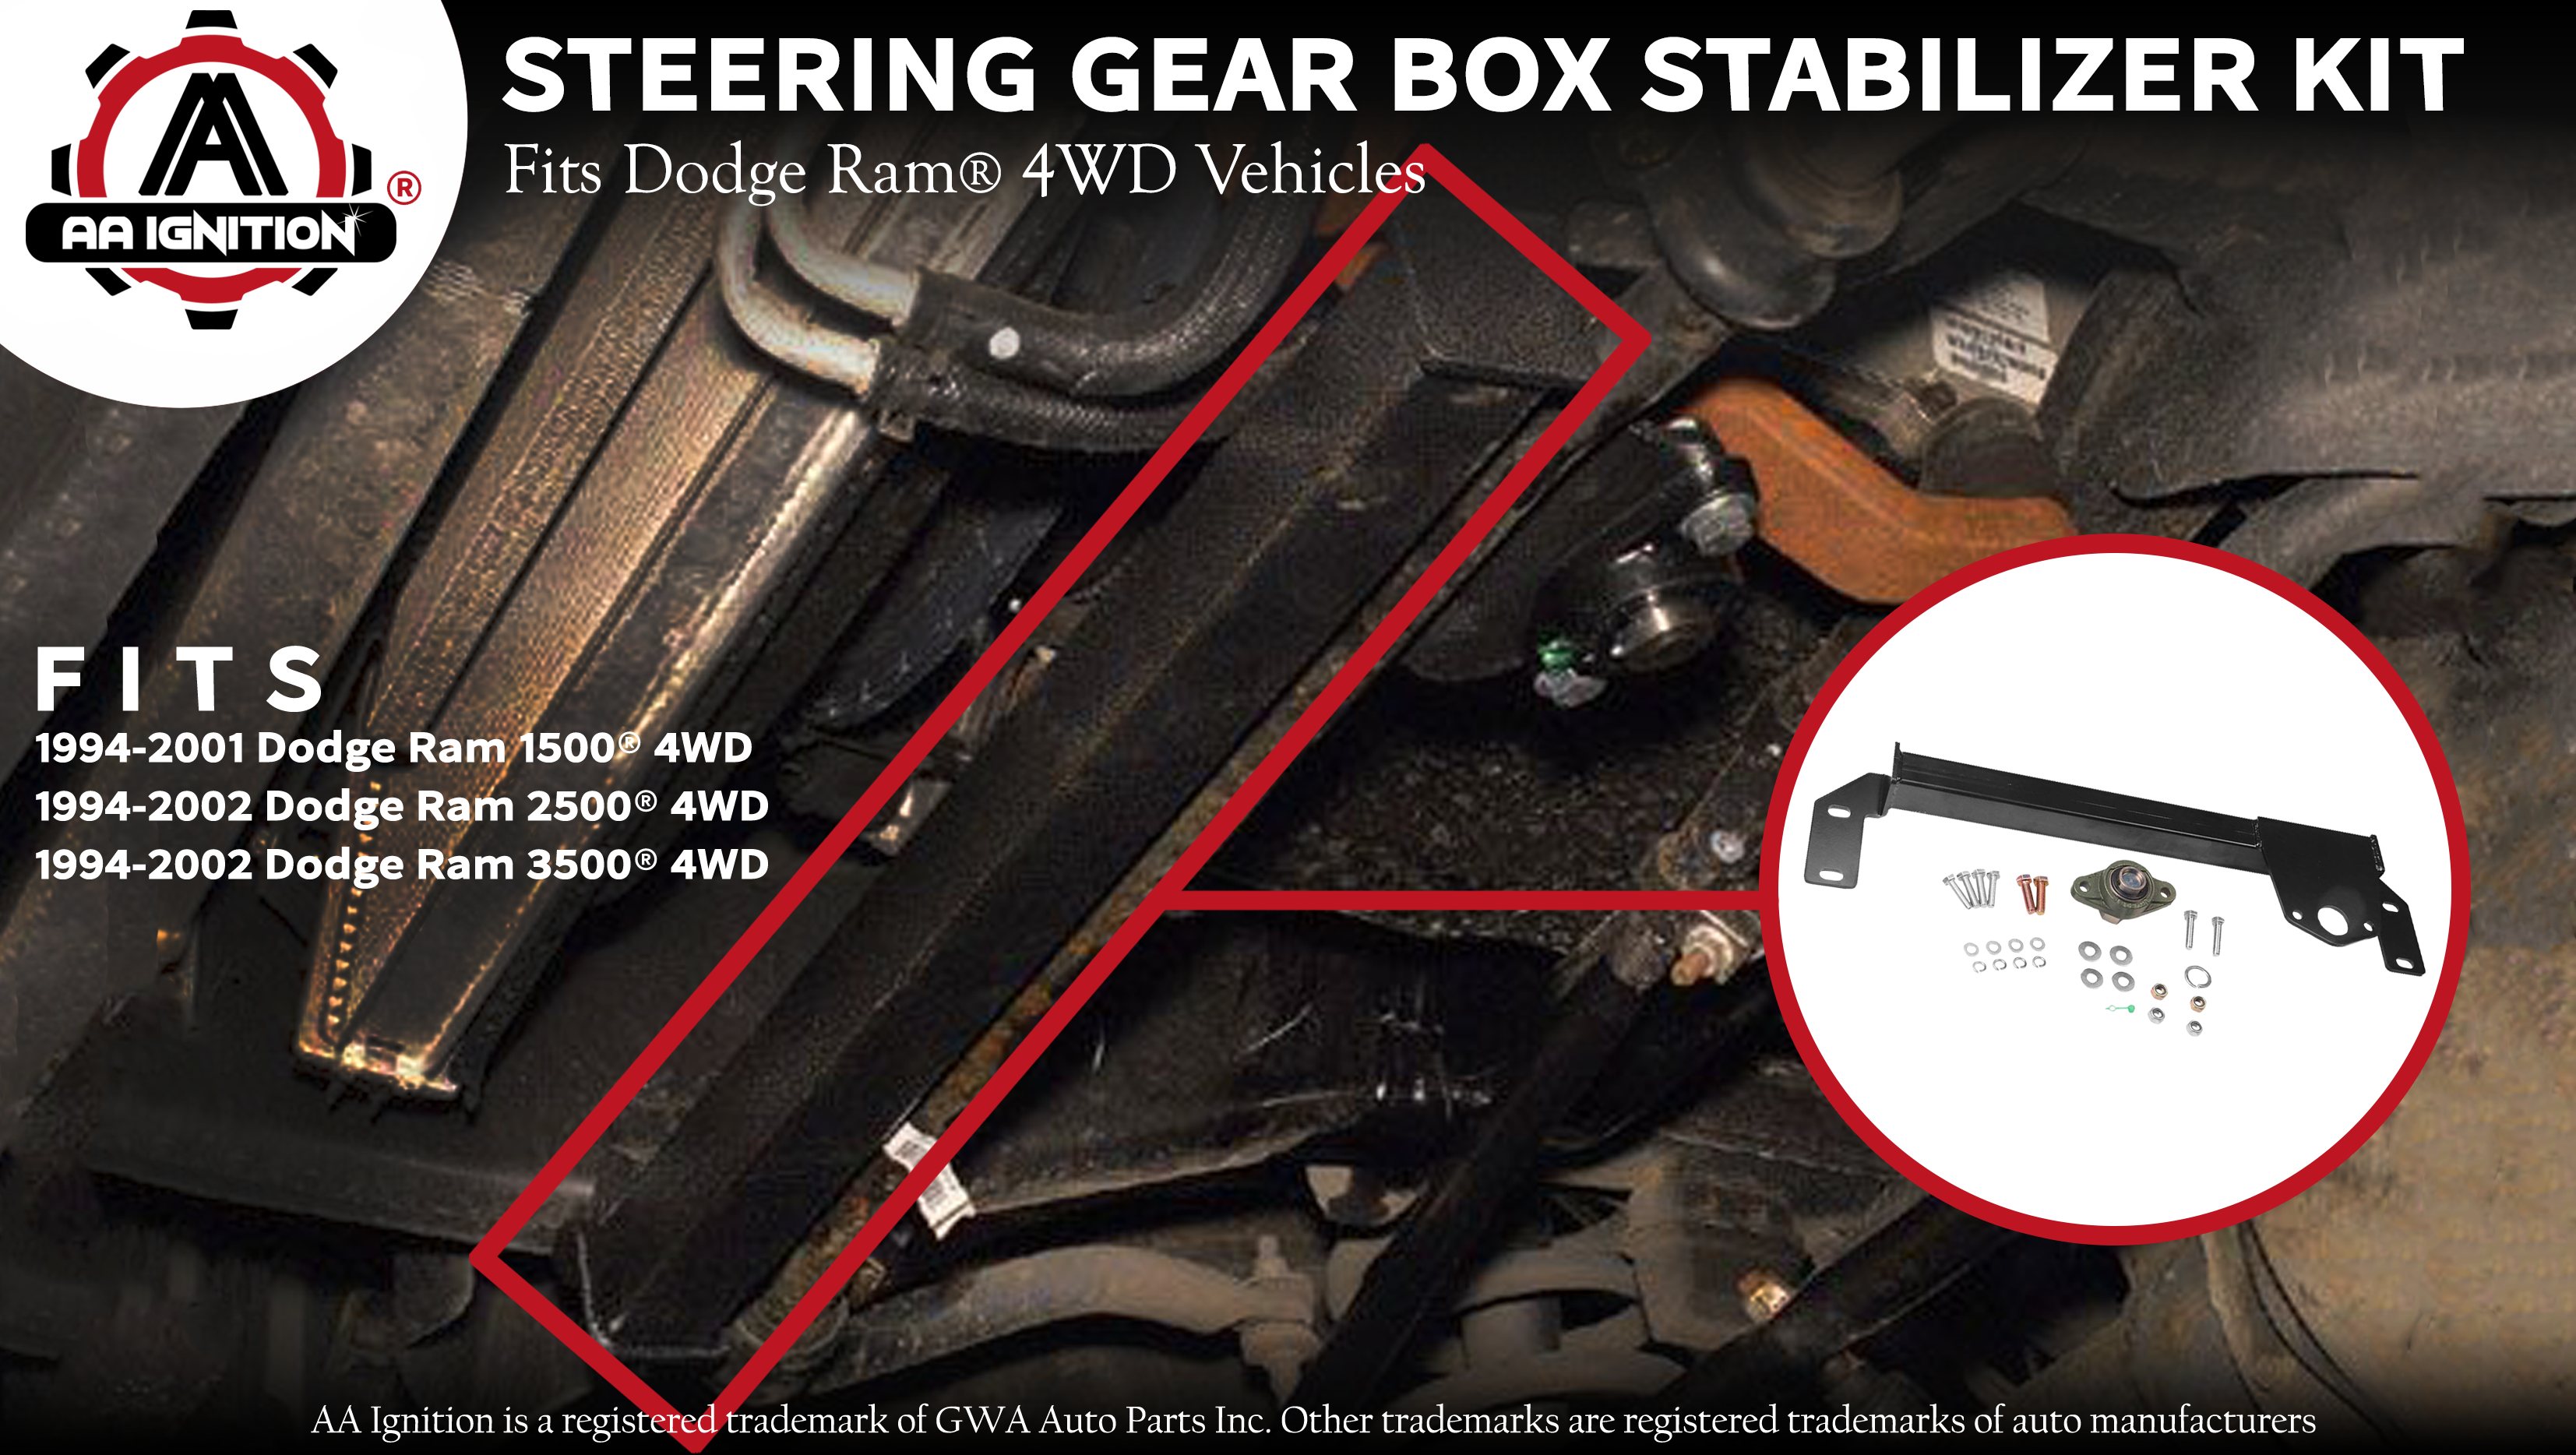 1994 2002 Dodge Ram 2500 3500 2WD Steering Gear Box Stabilizer Bar Brace NEW